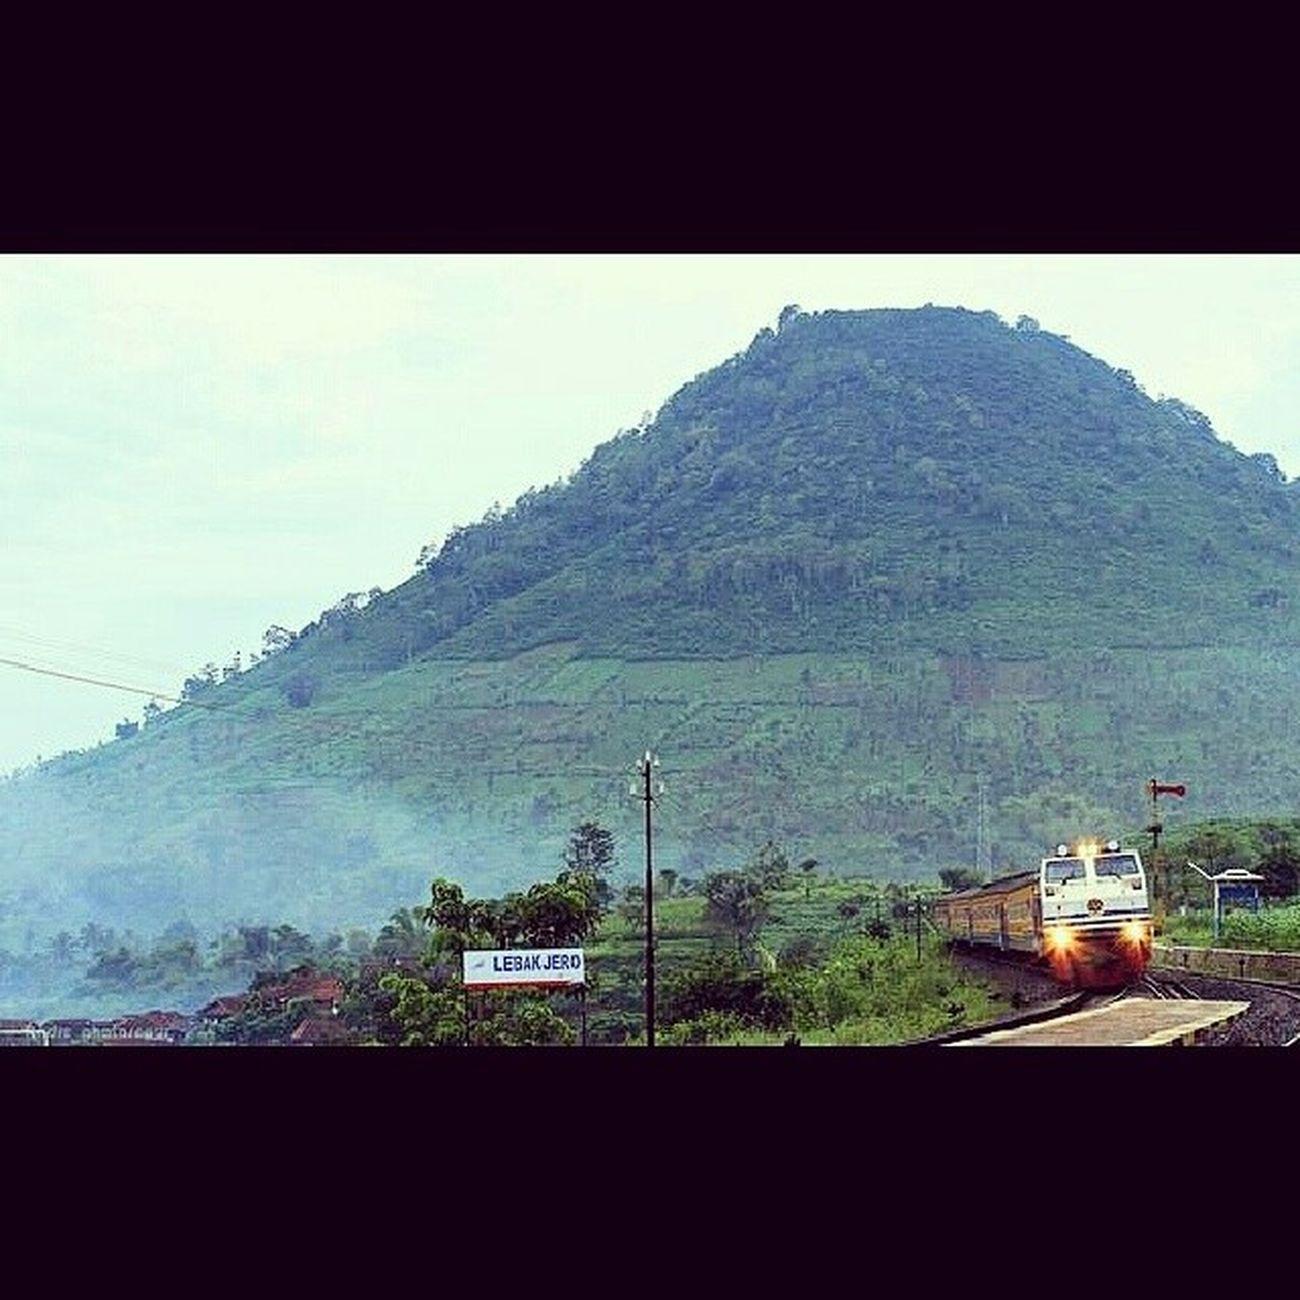 Suatu pagi di lebakjero garut LBJ Instapict Instalike Railfans garut daop2 bandung indonesia